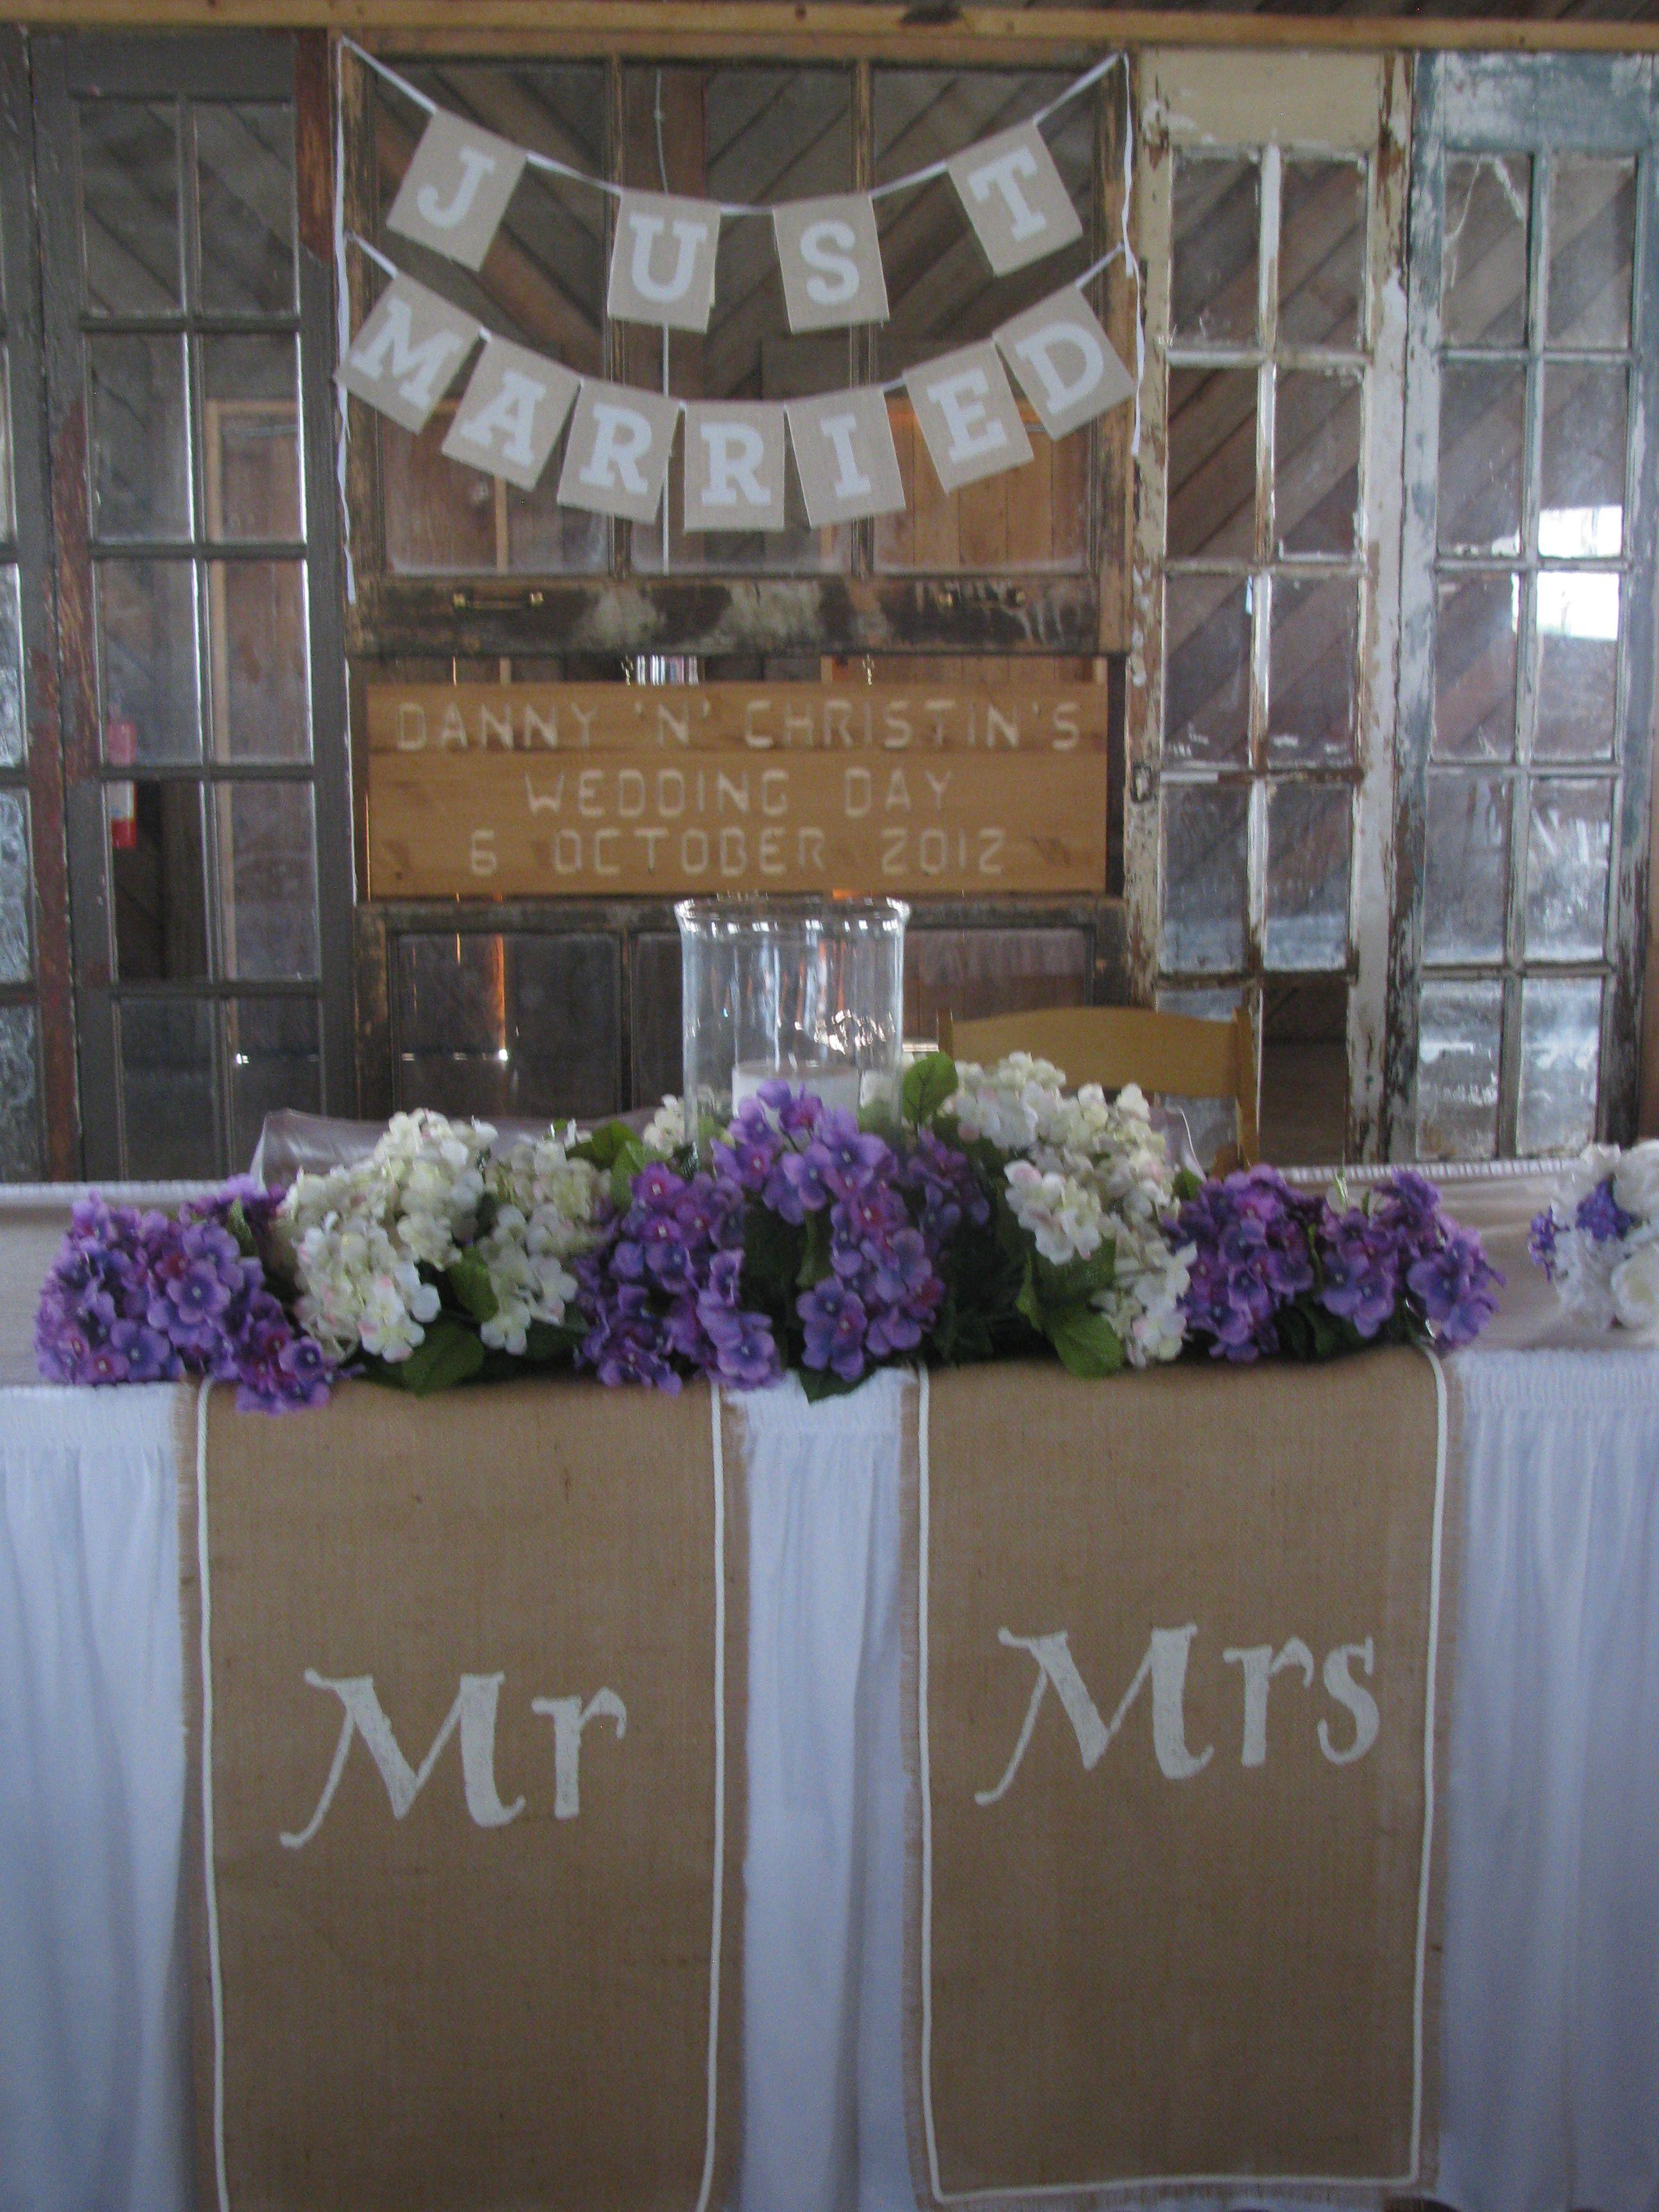 Bride Groom Wedding Table Ideas : Bride and groom table home wedding ideas